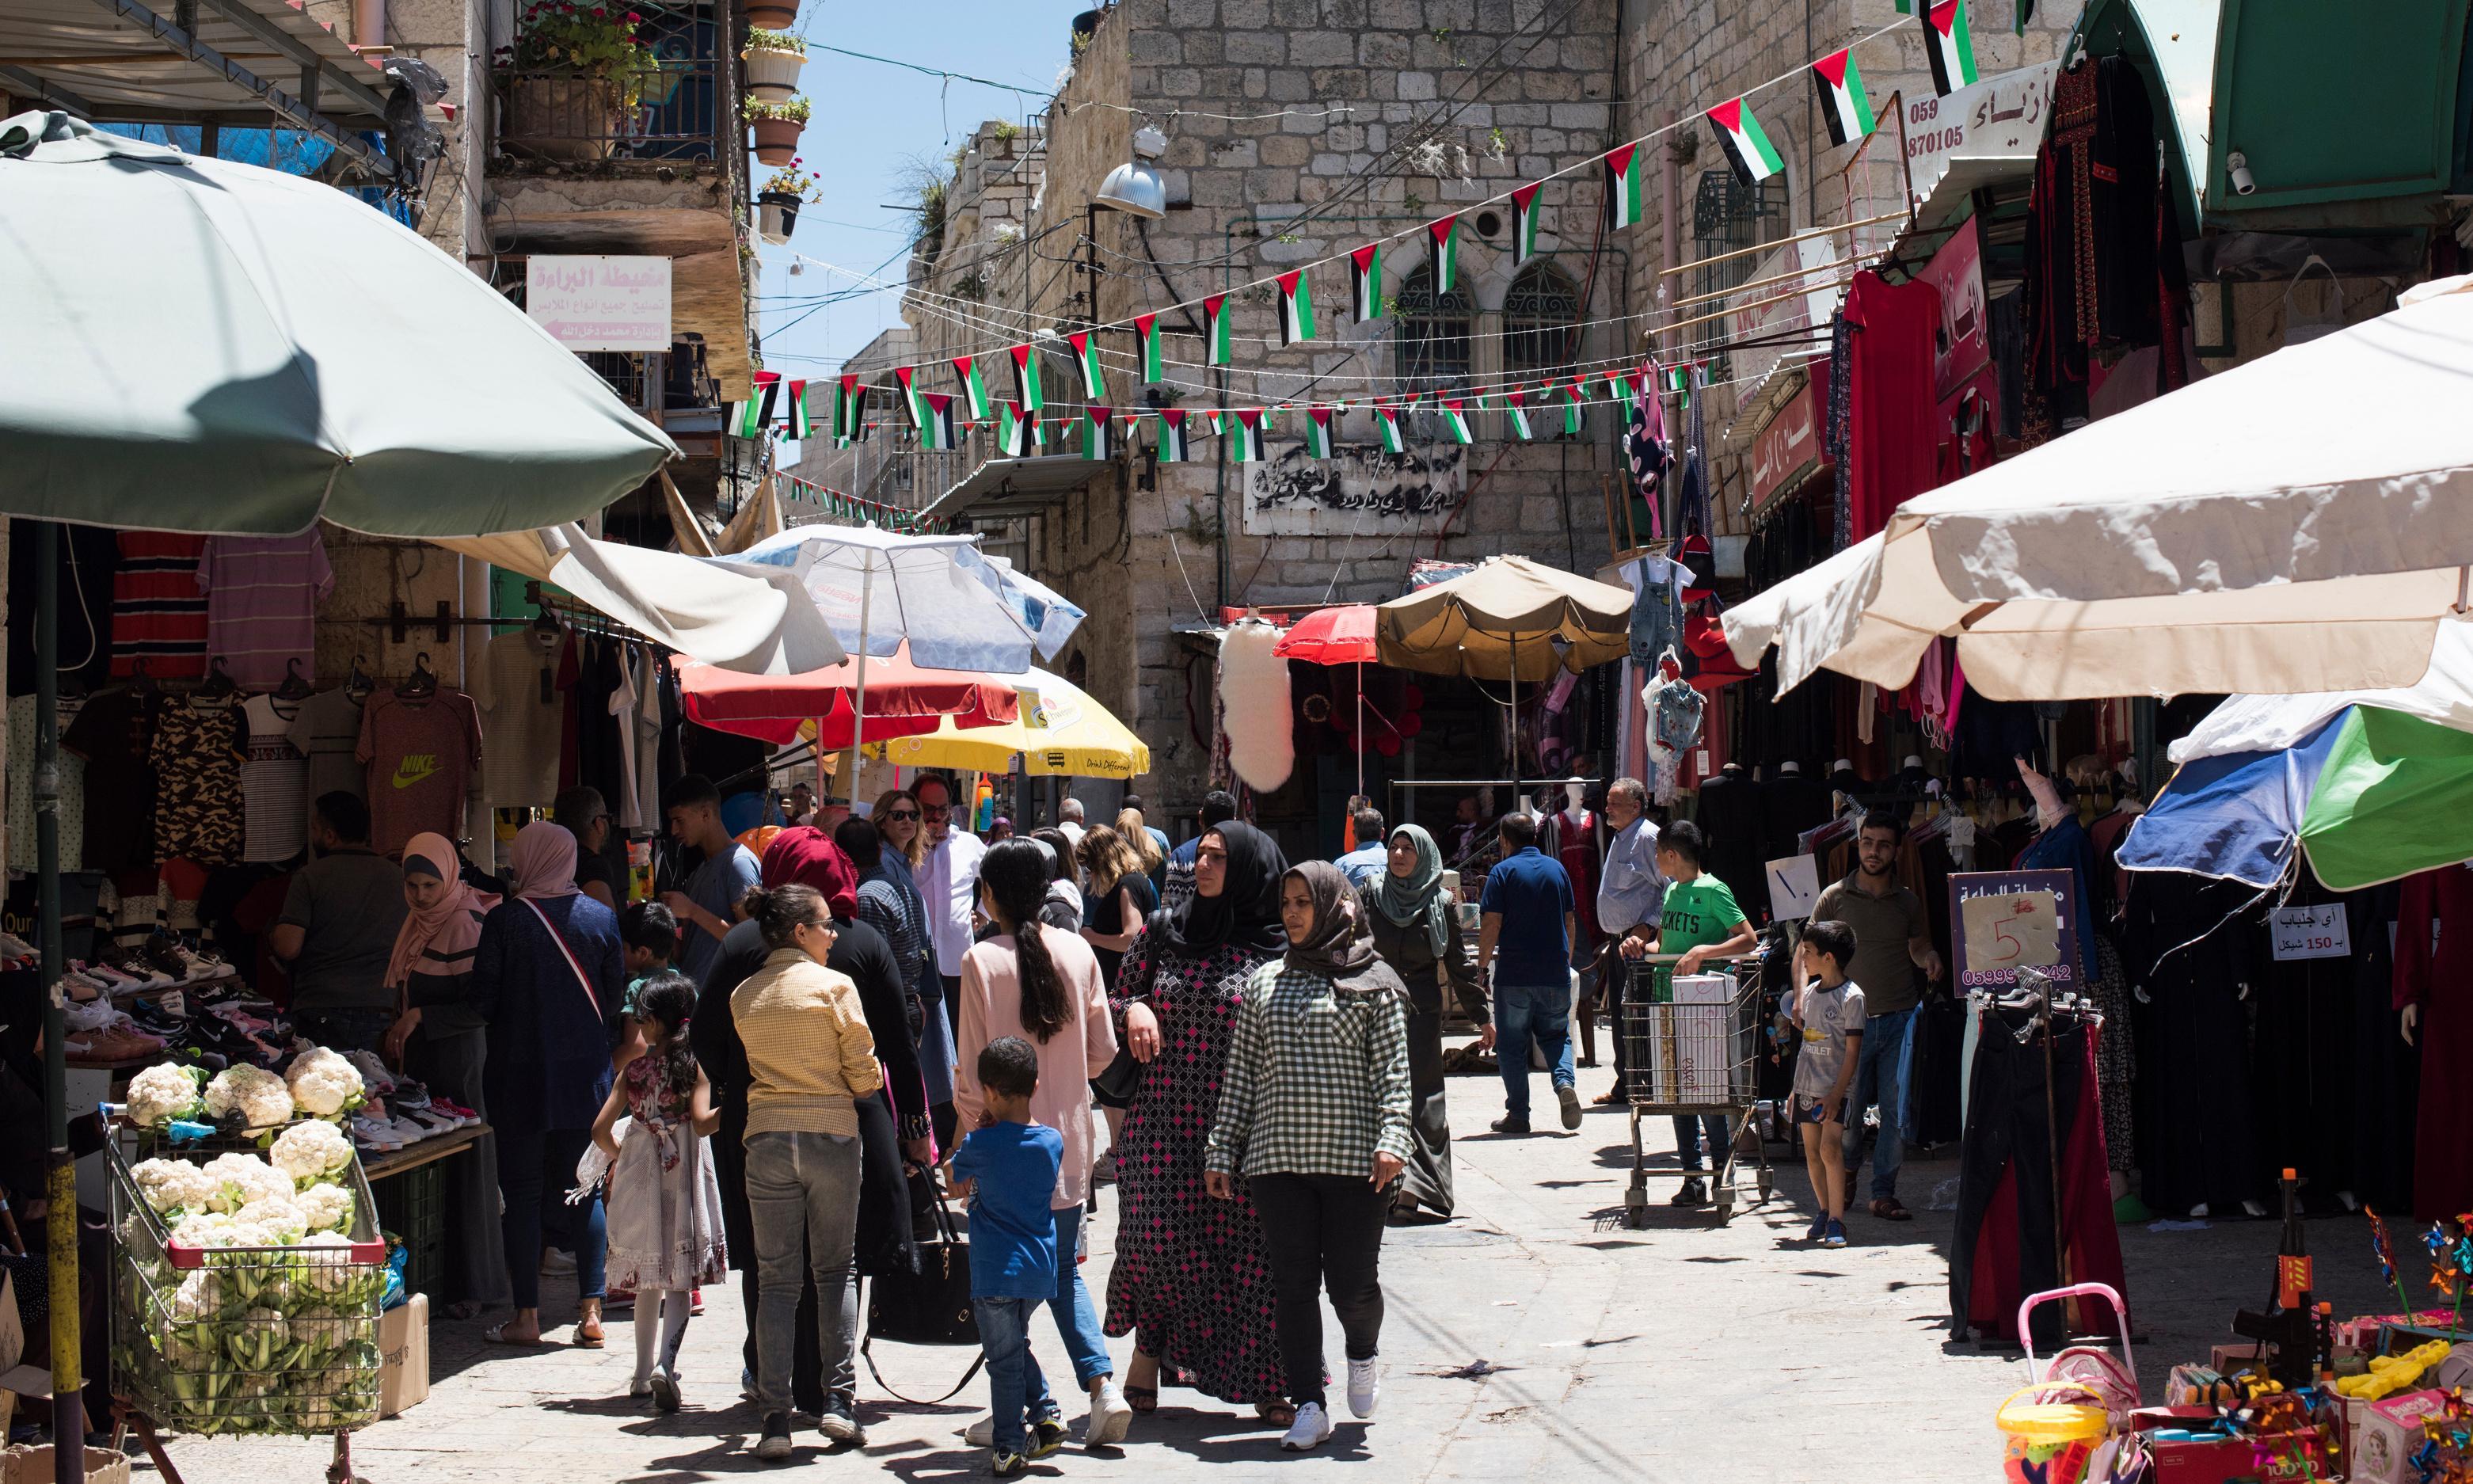 Little town of Bethlehem – a travel photo essay